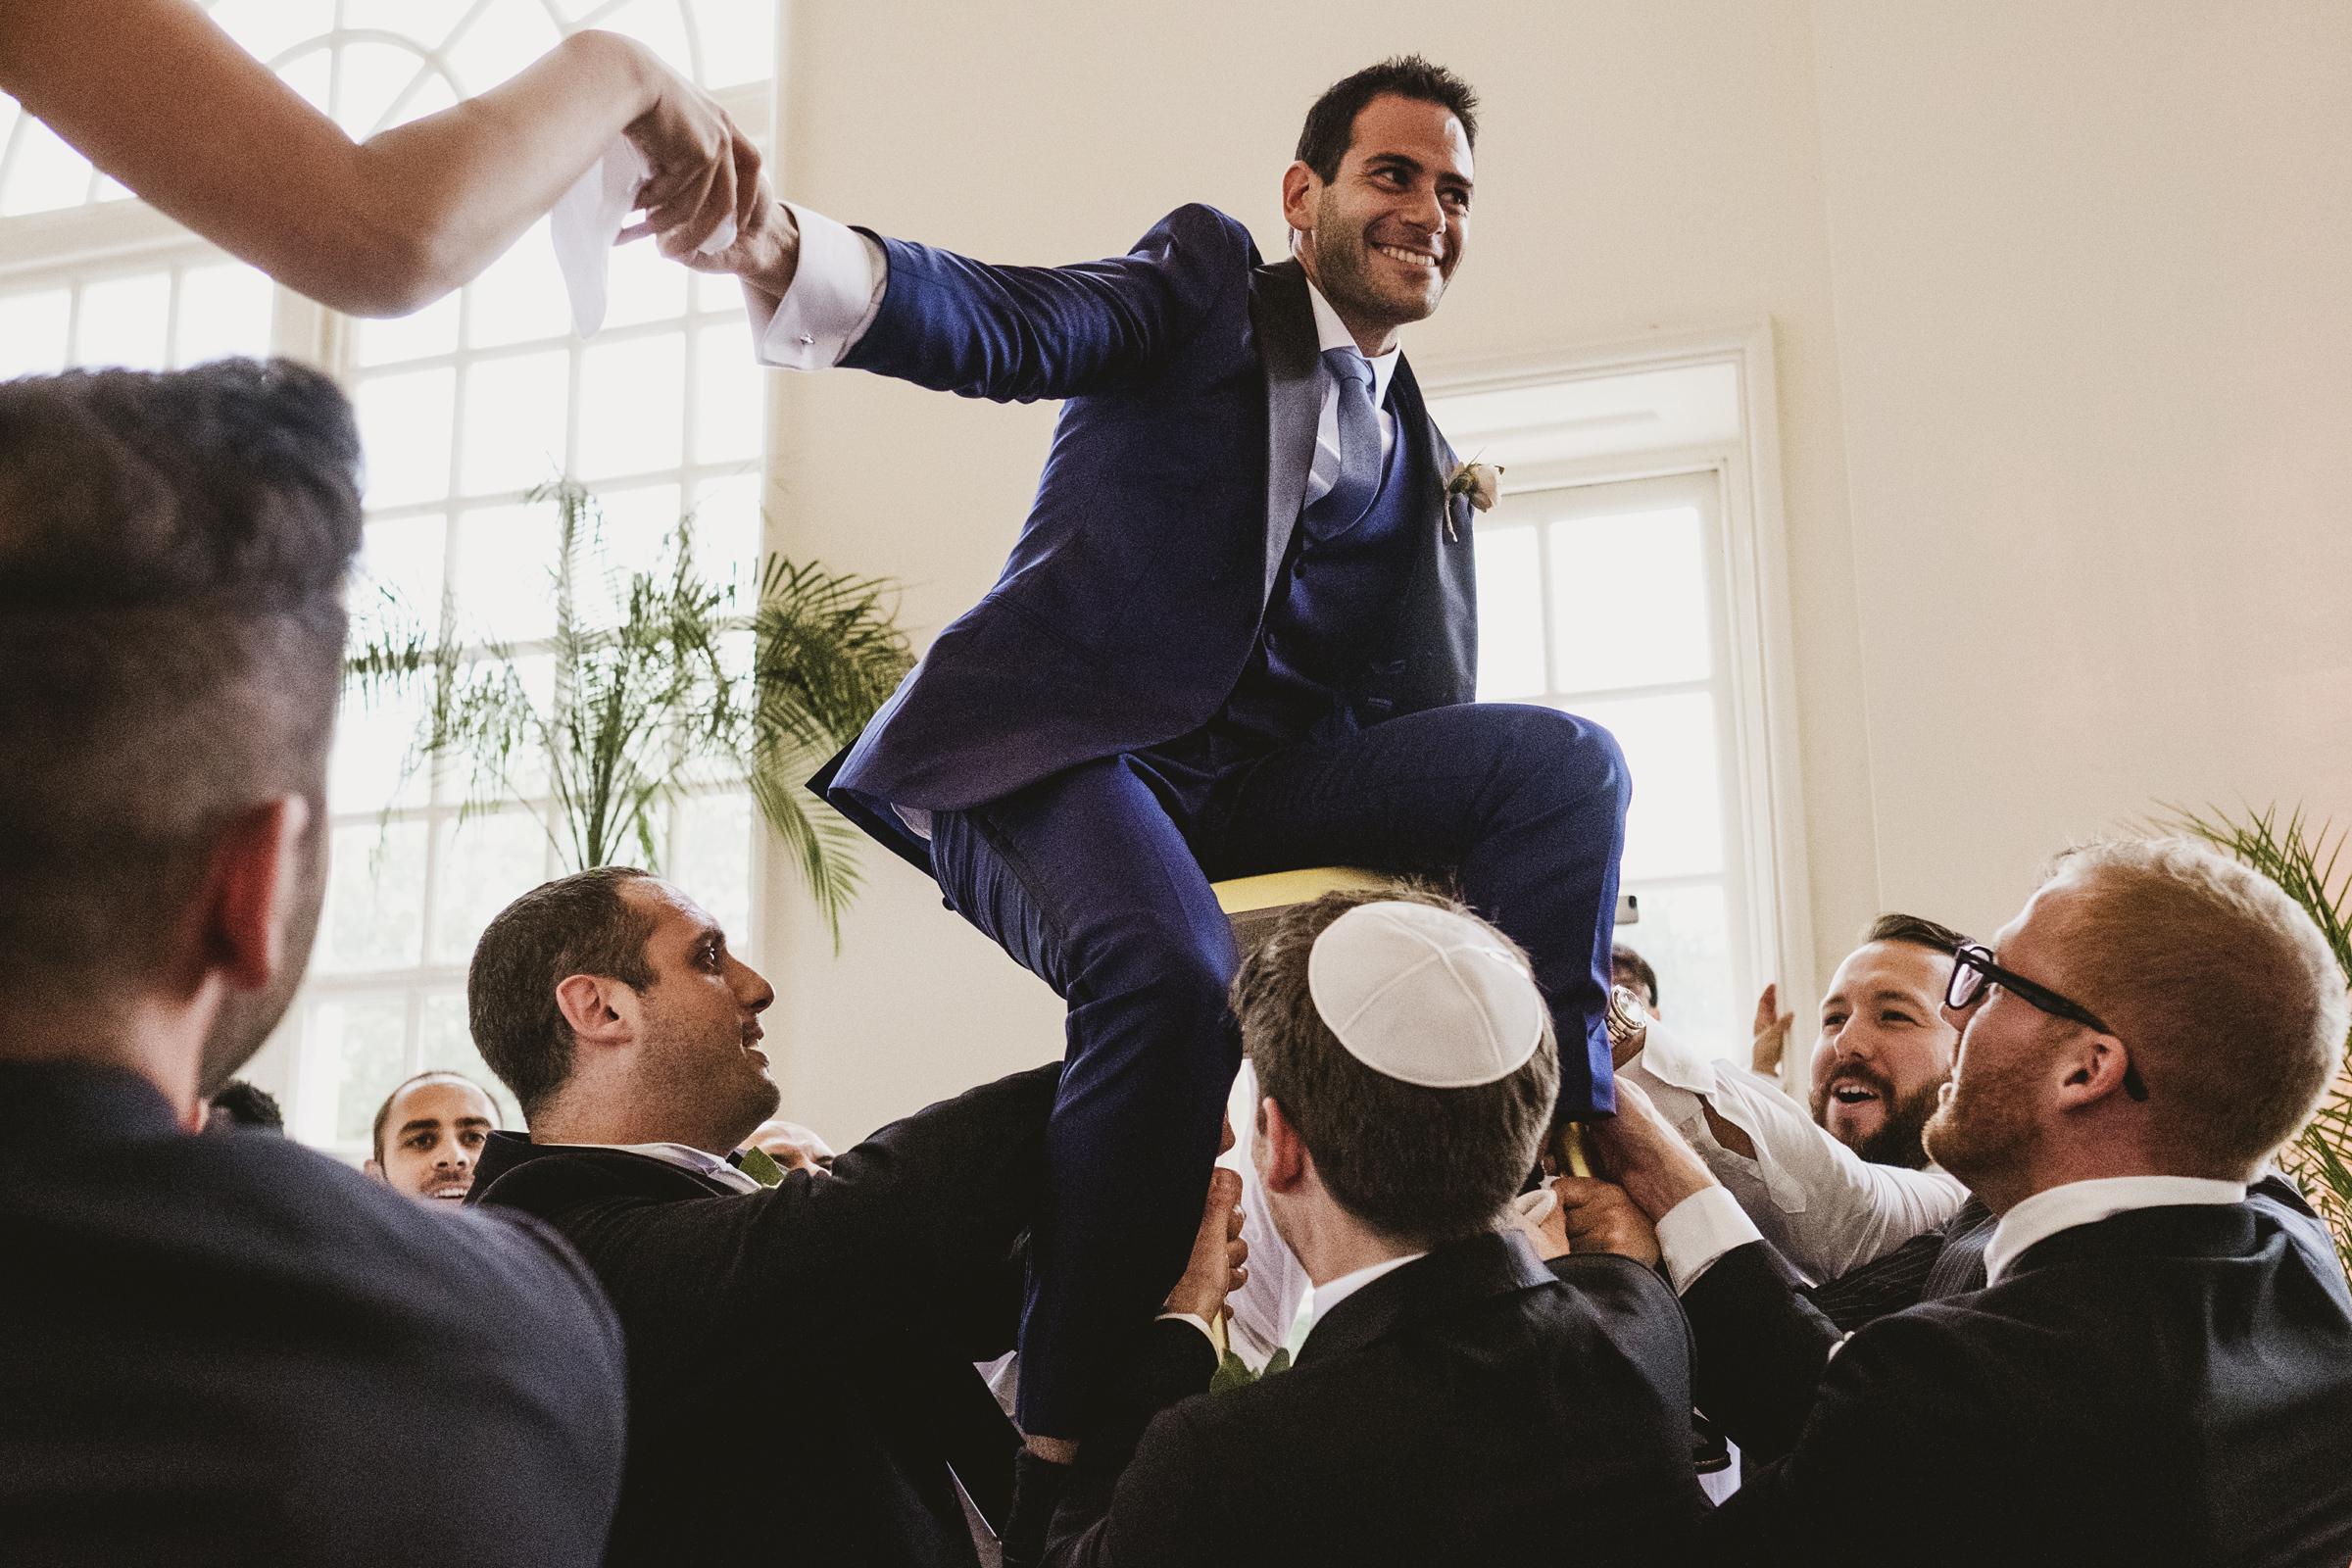 Groom aloft at Jewish wedding - photo by York Place Studios